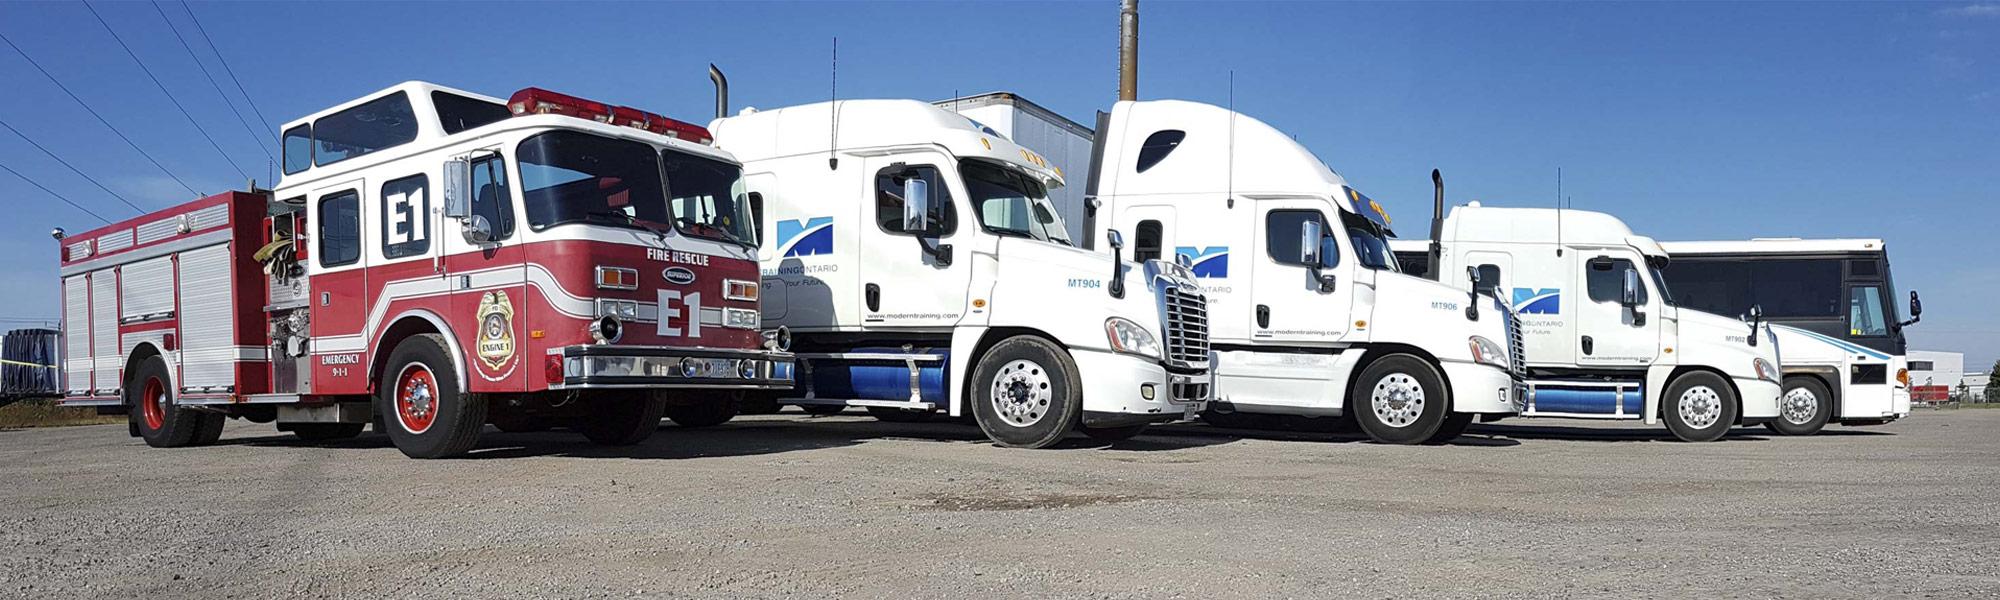 Delivering skilled, confident drivers